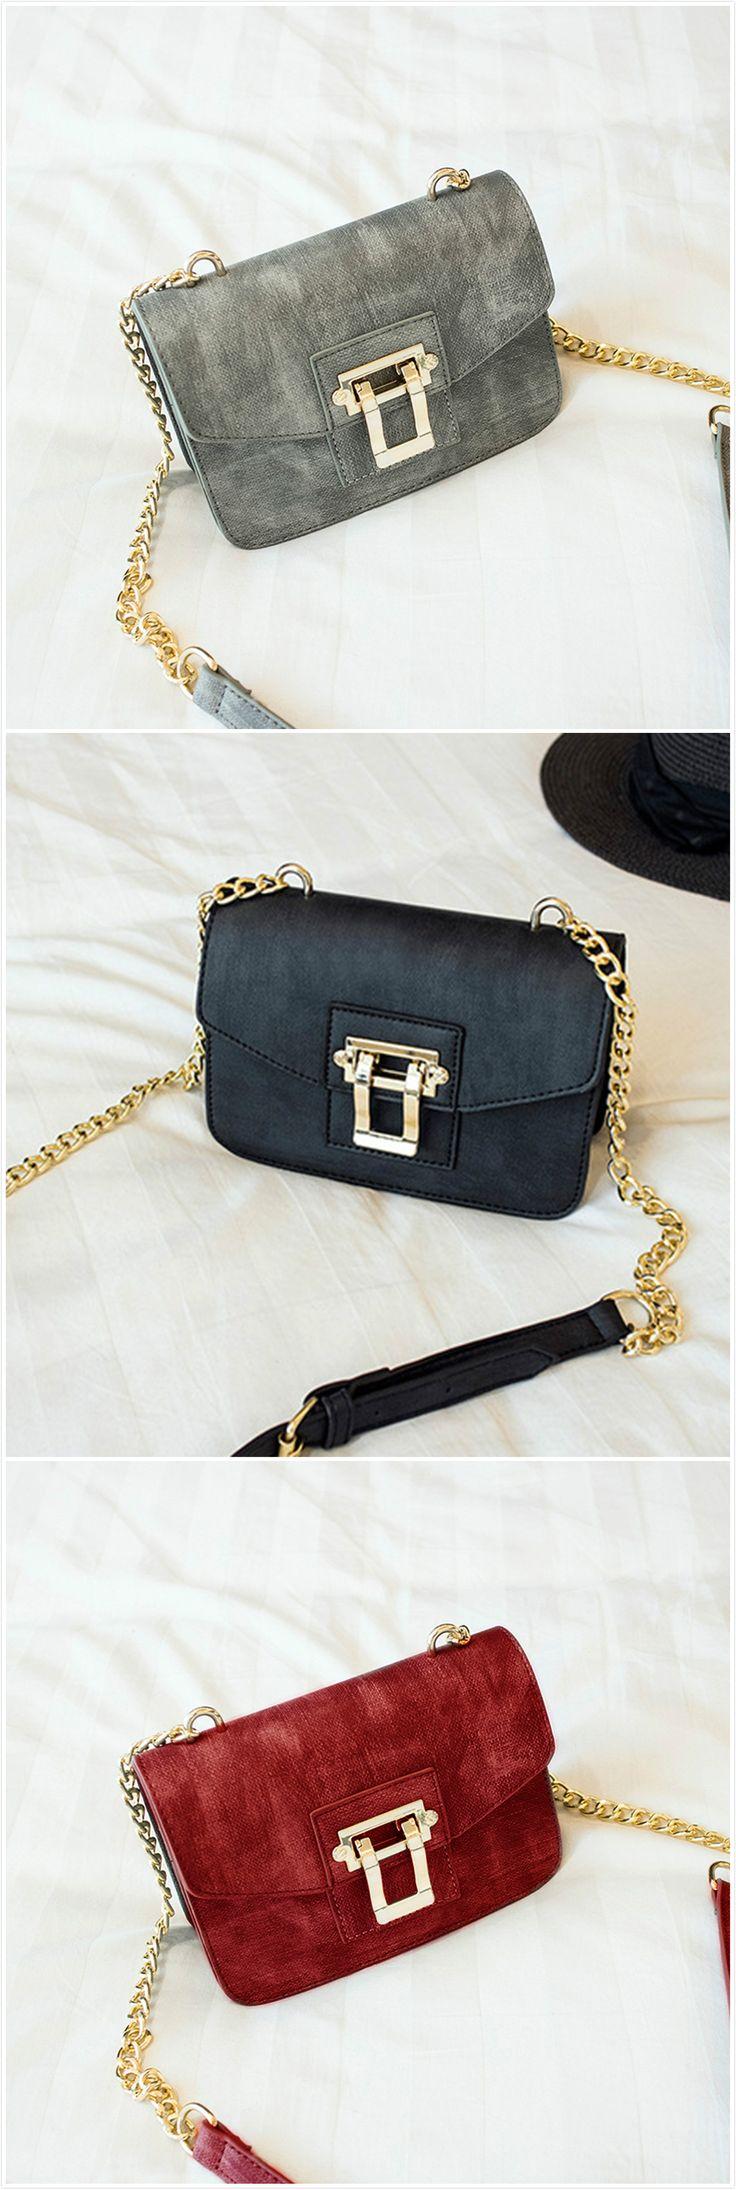 Fashion Small Cross Chain Shoulder Bag